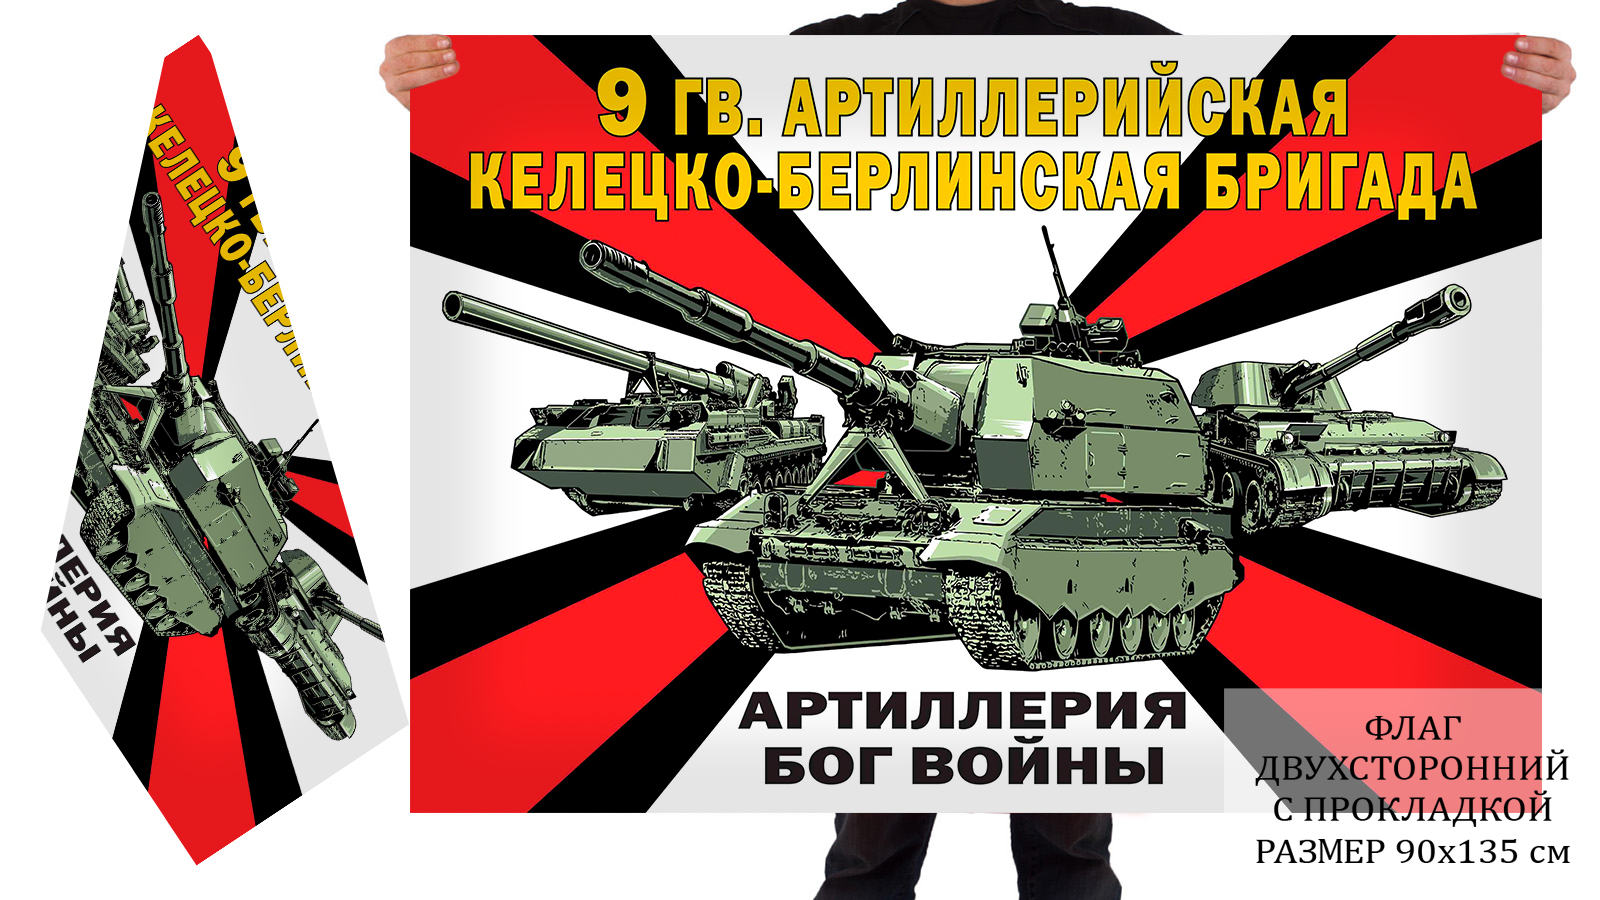 Двусторонний флаг 9 гвардейской Келецко-Берлинской артбригады